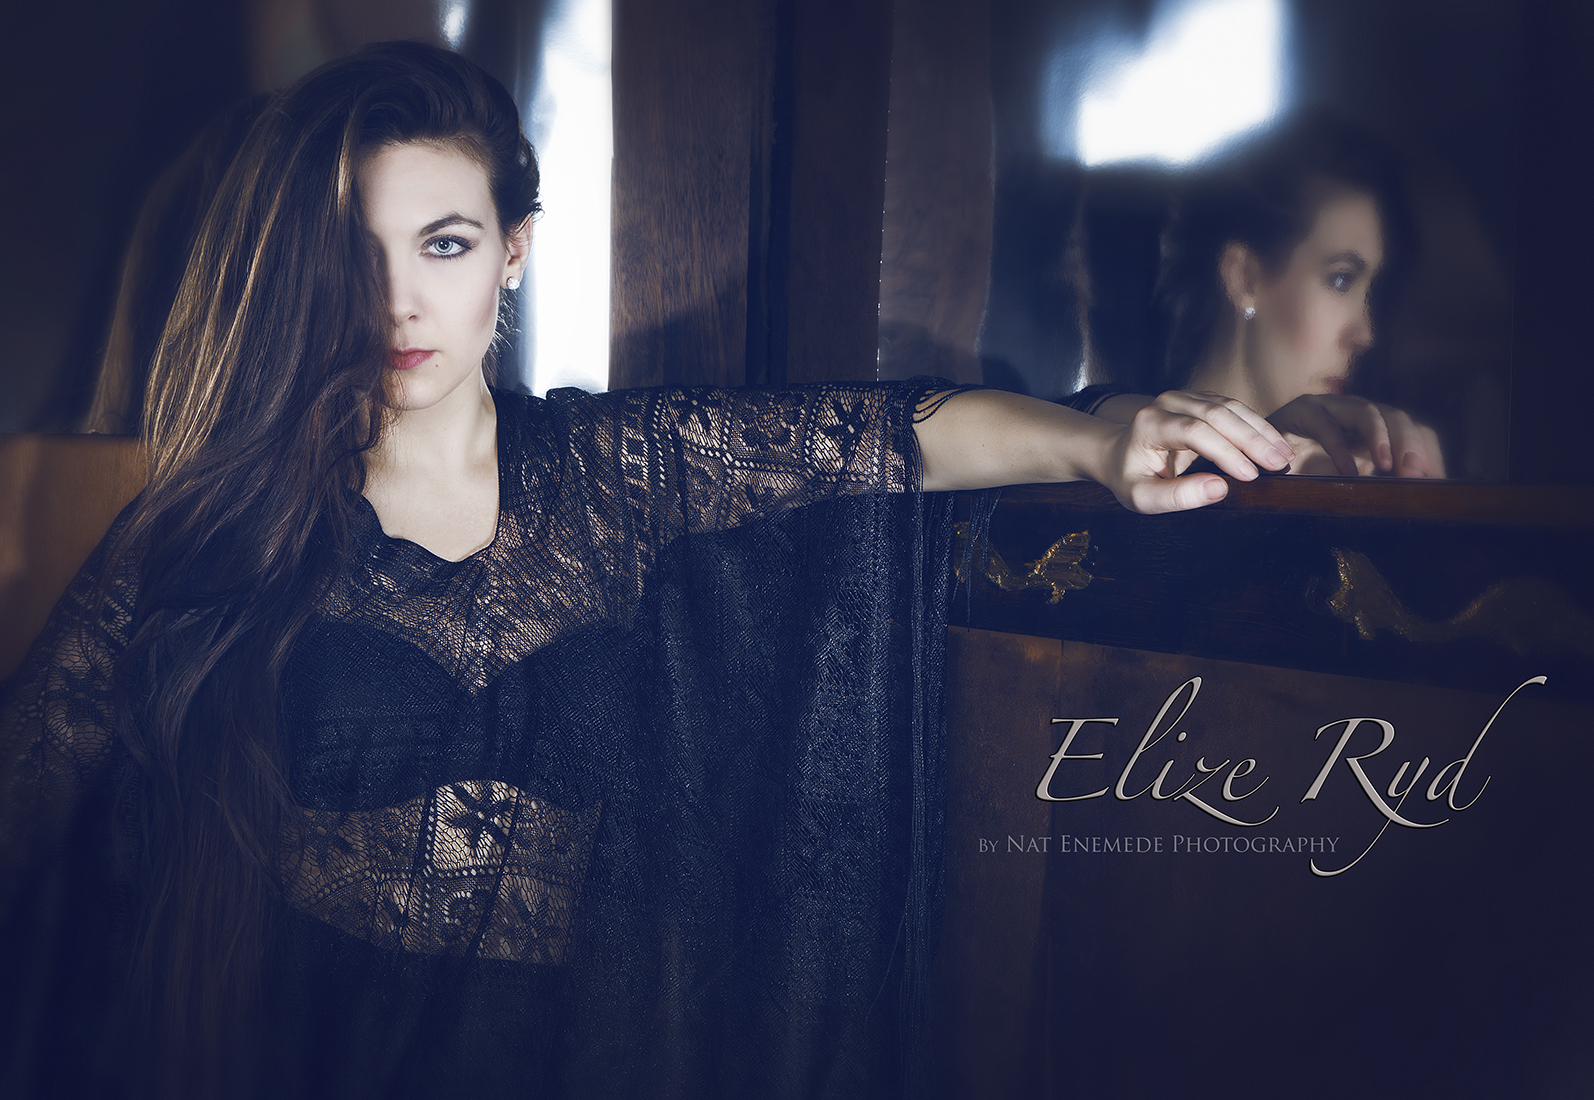 Elize Ryd